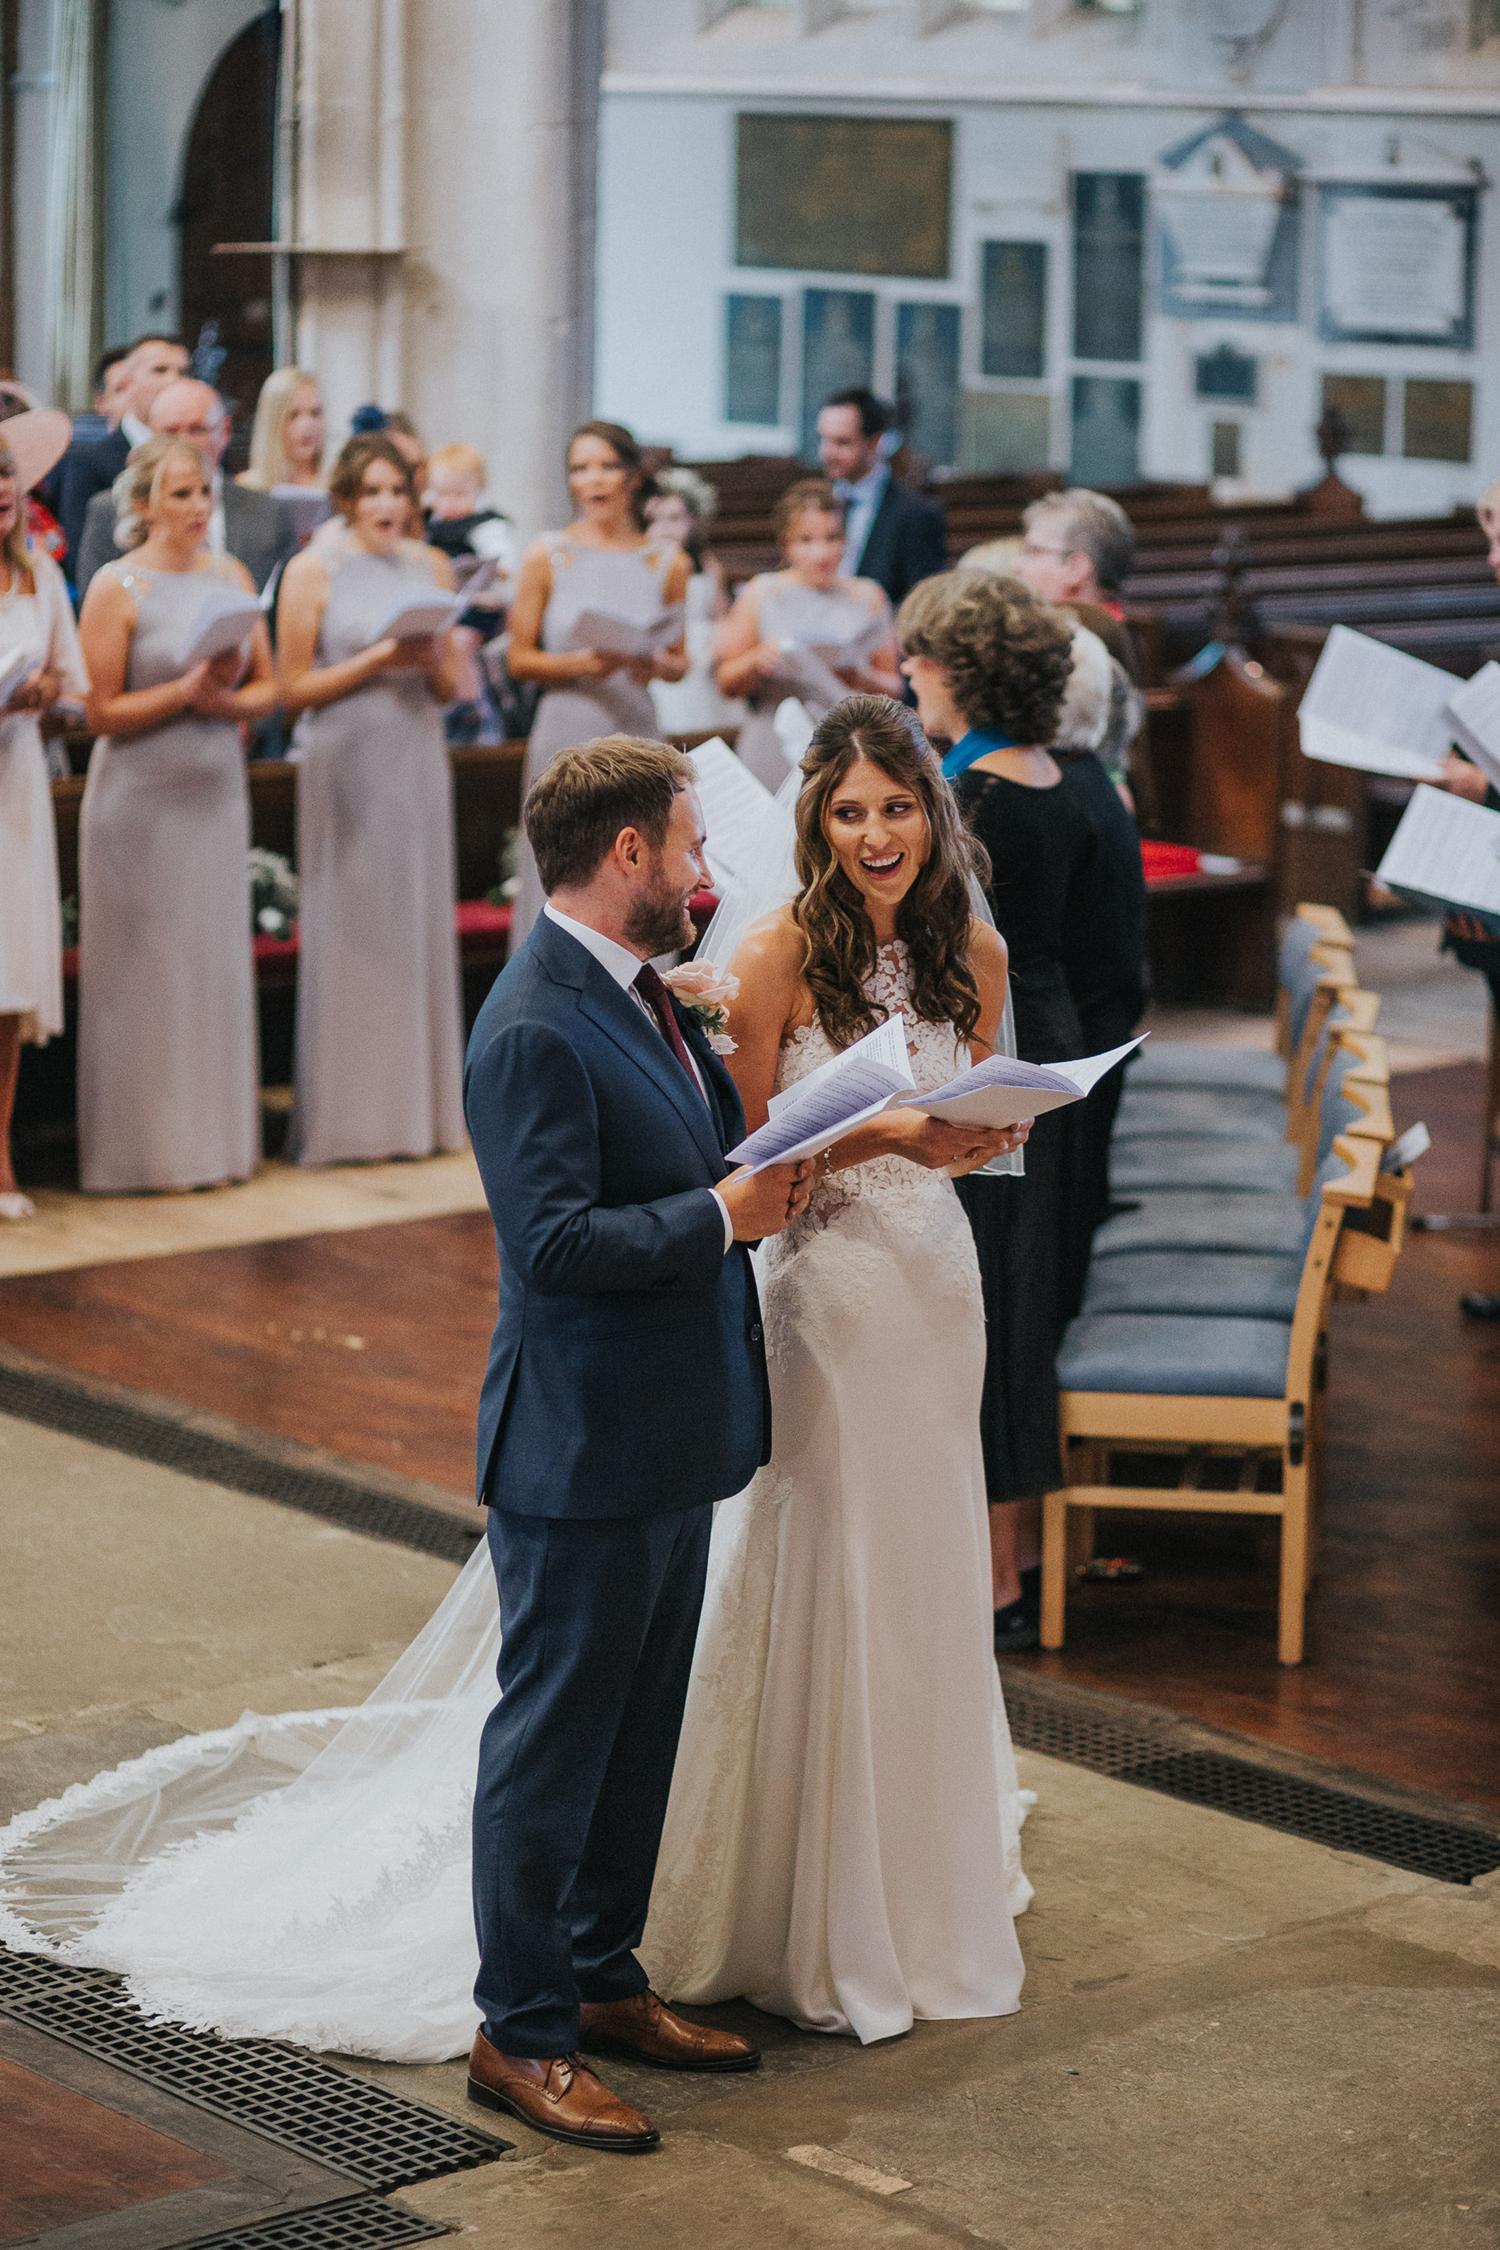 Orangery Maidstone Wedding Photographer065.jpg